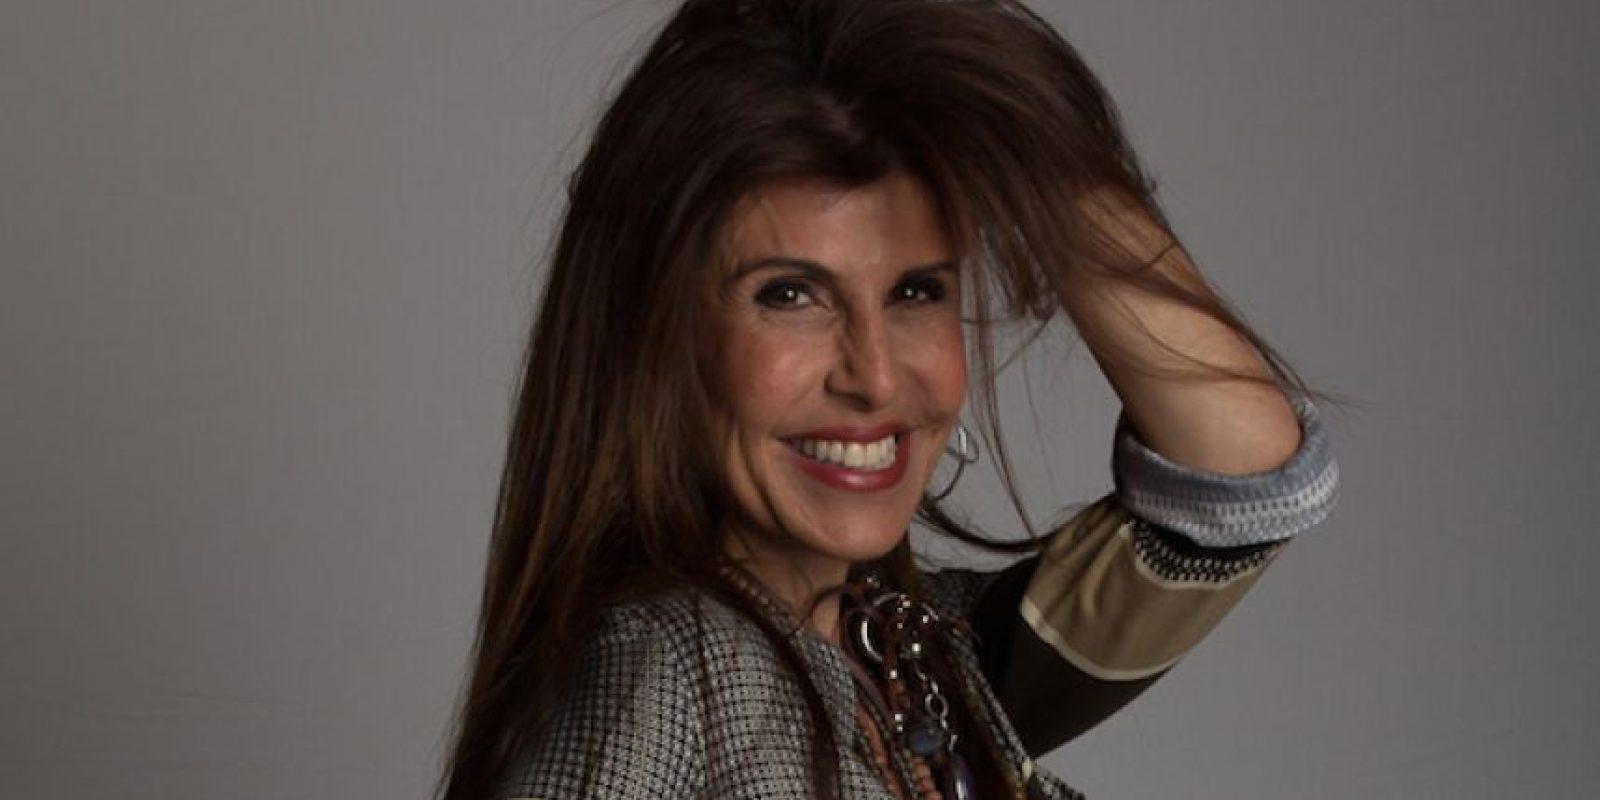 Foto: Foto: José Luis Escobedo / Maquillaje: Loraine Farrington / Peinado: Vilma Coy